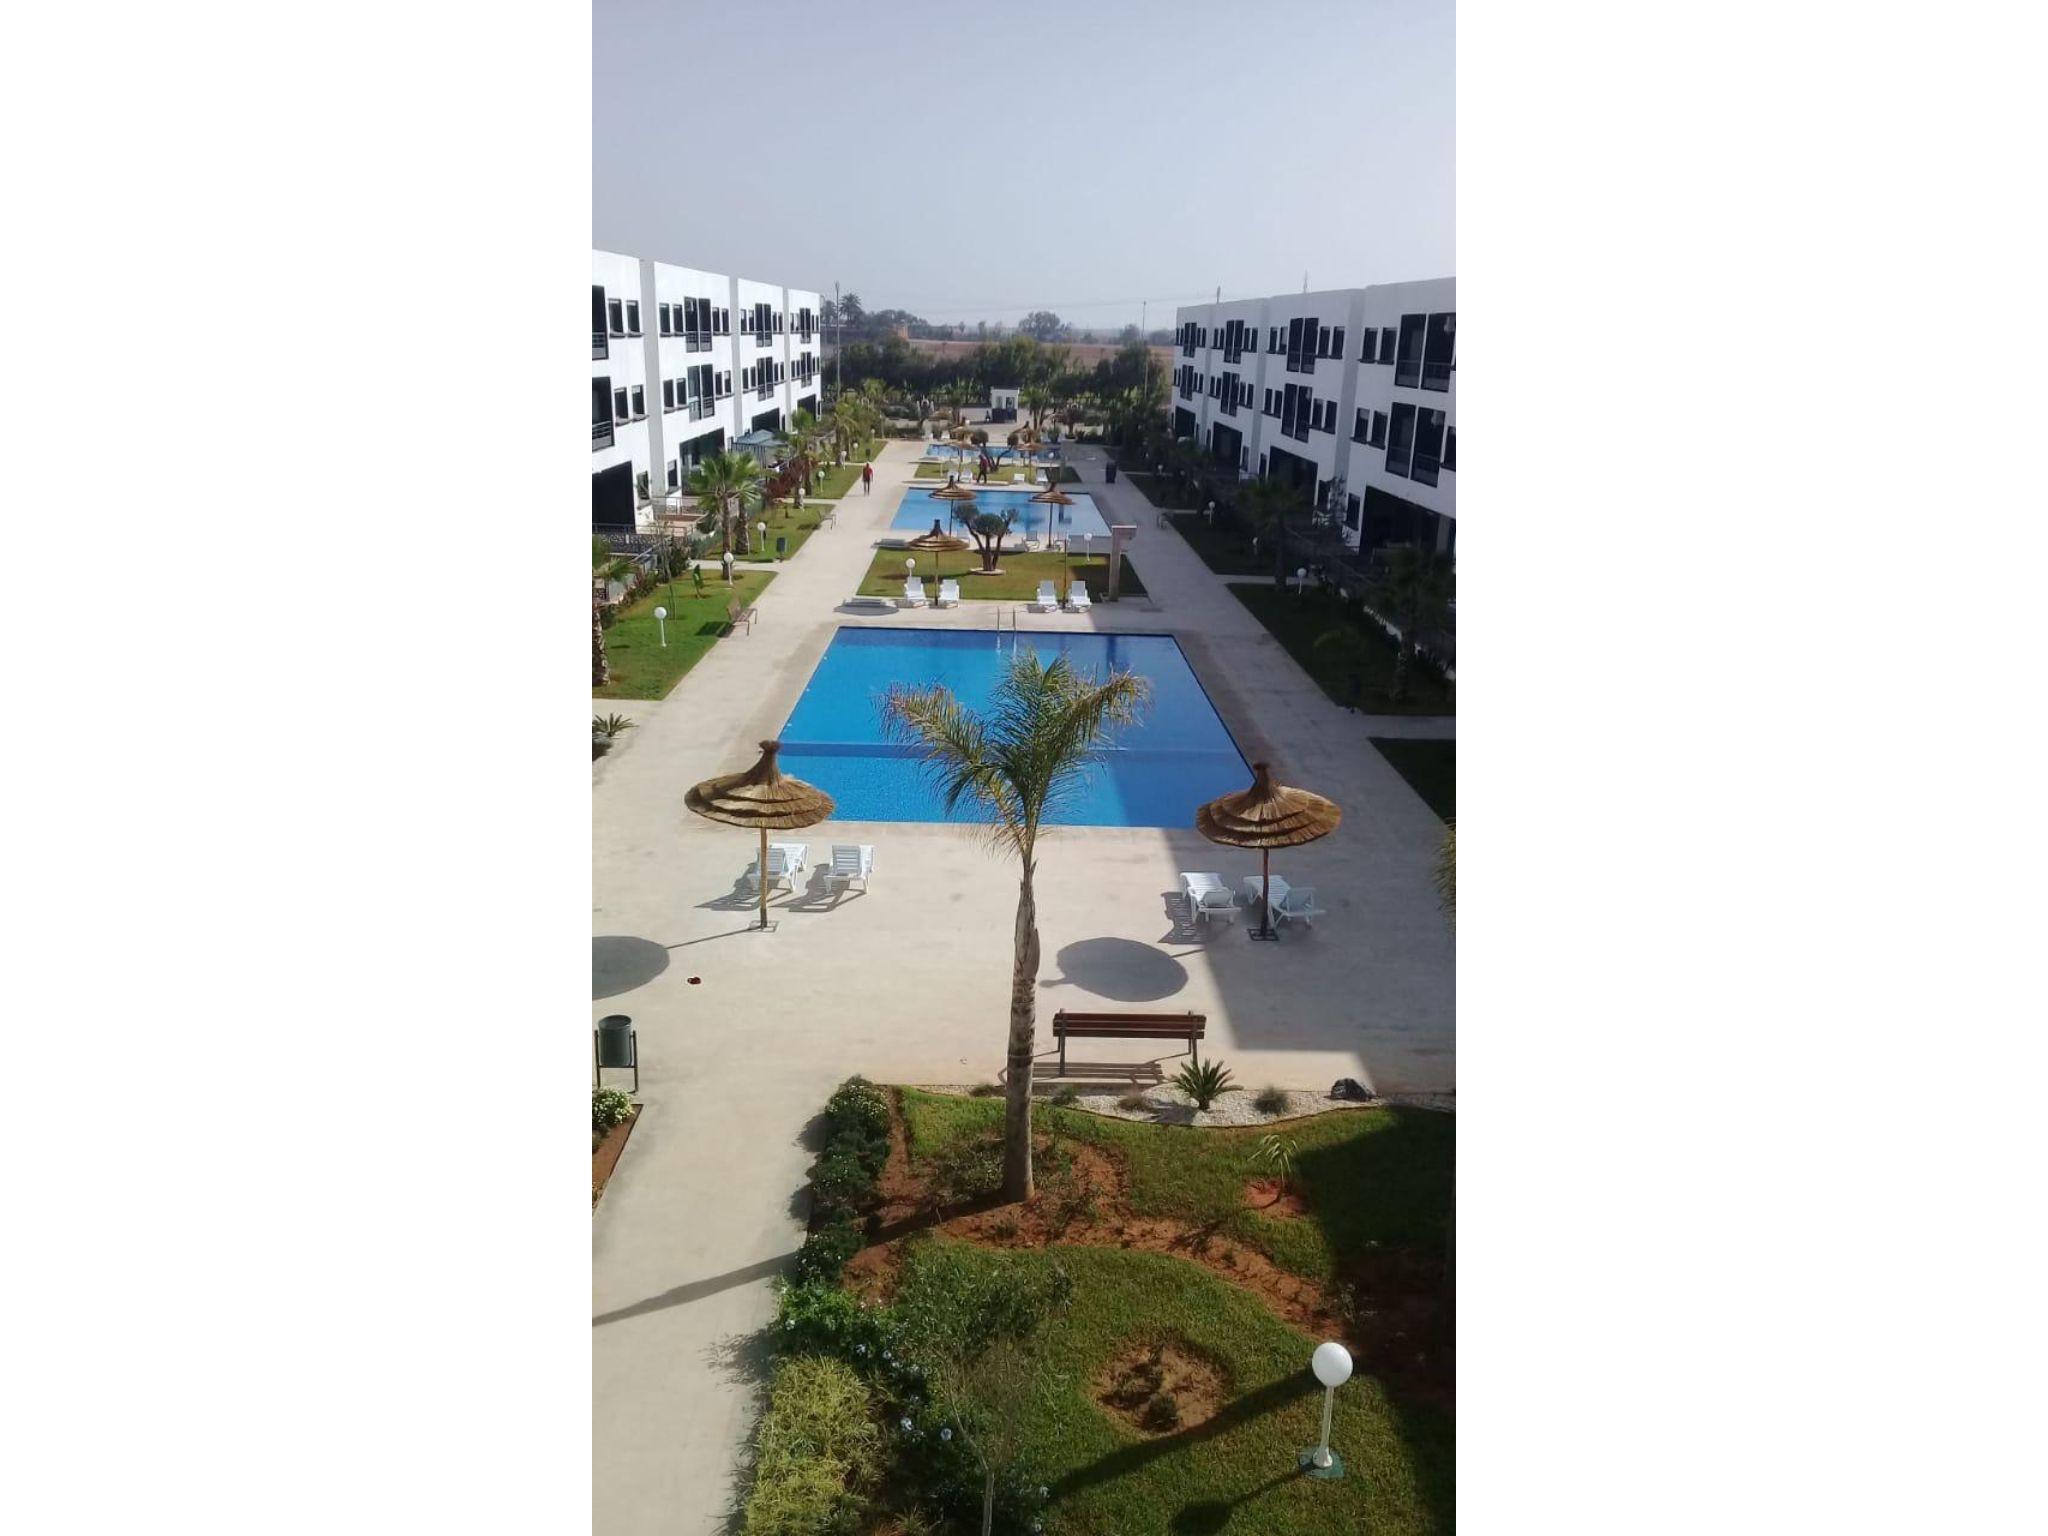 Magic housse sea view Ferienwohnung in Marokko